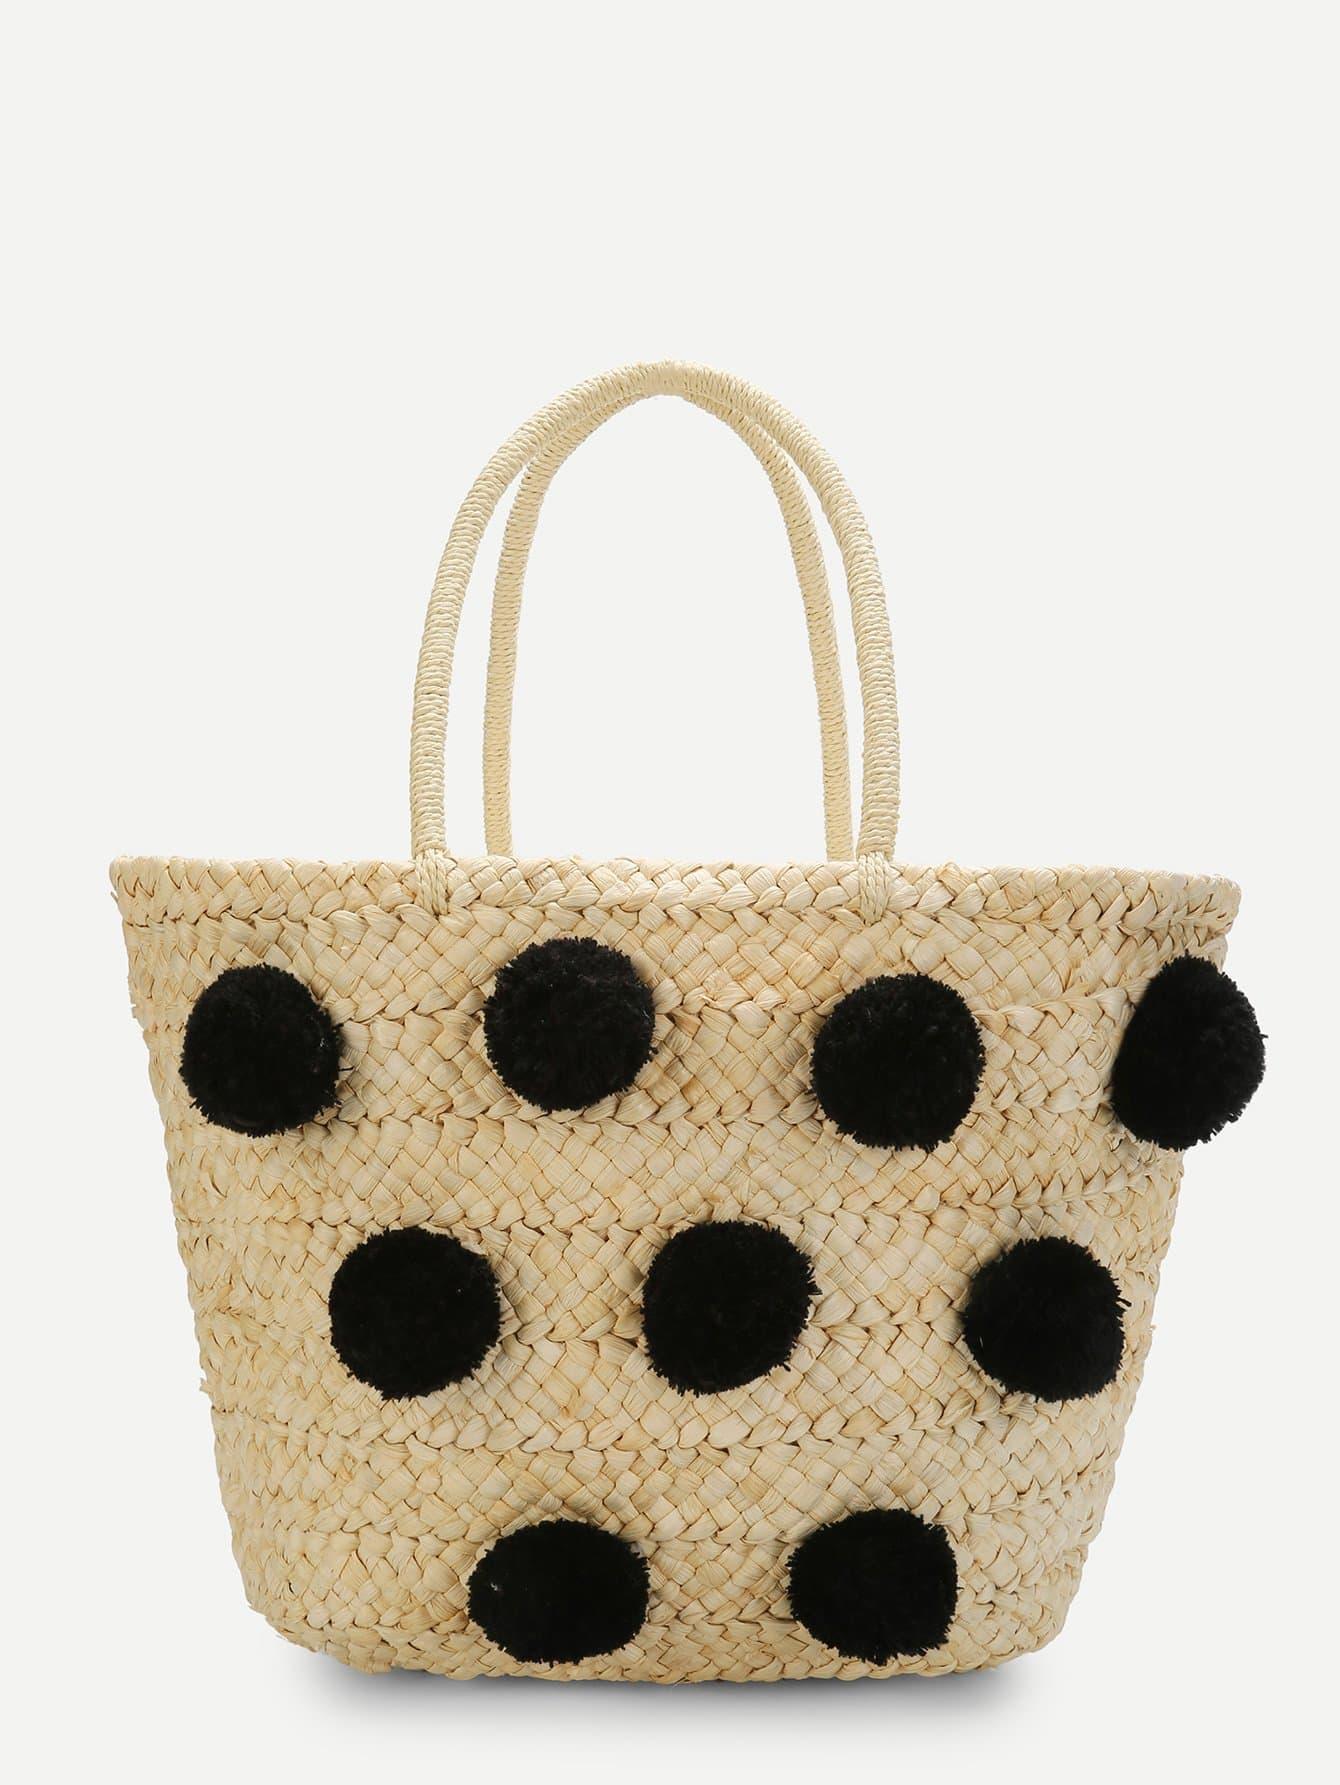 Straw Tote Bag With Pom Pom straw flamingo embroidered tote bag